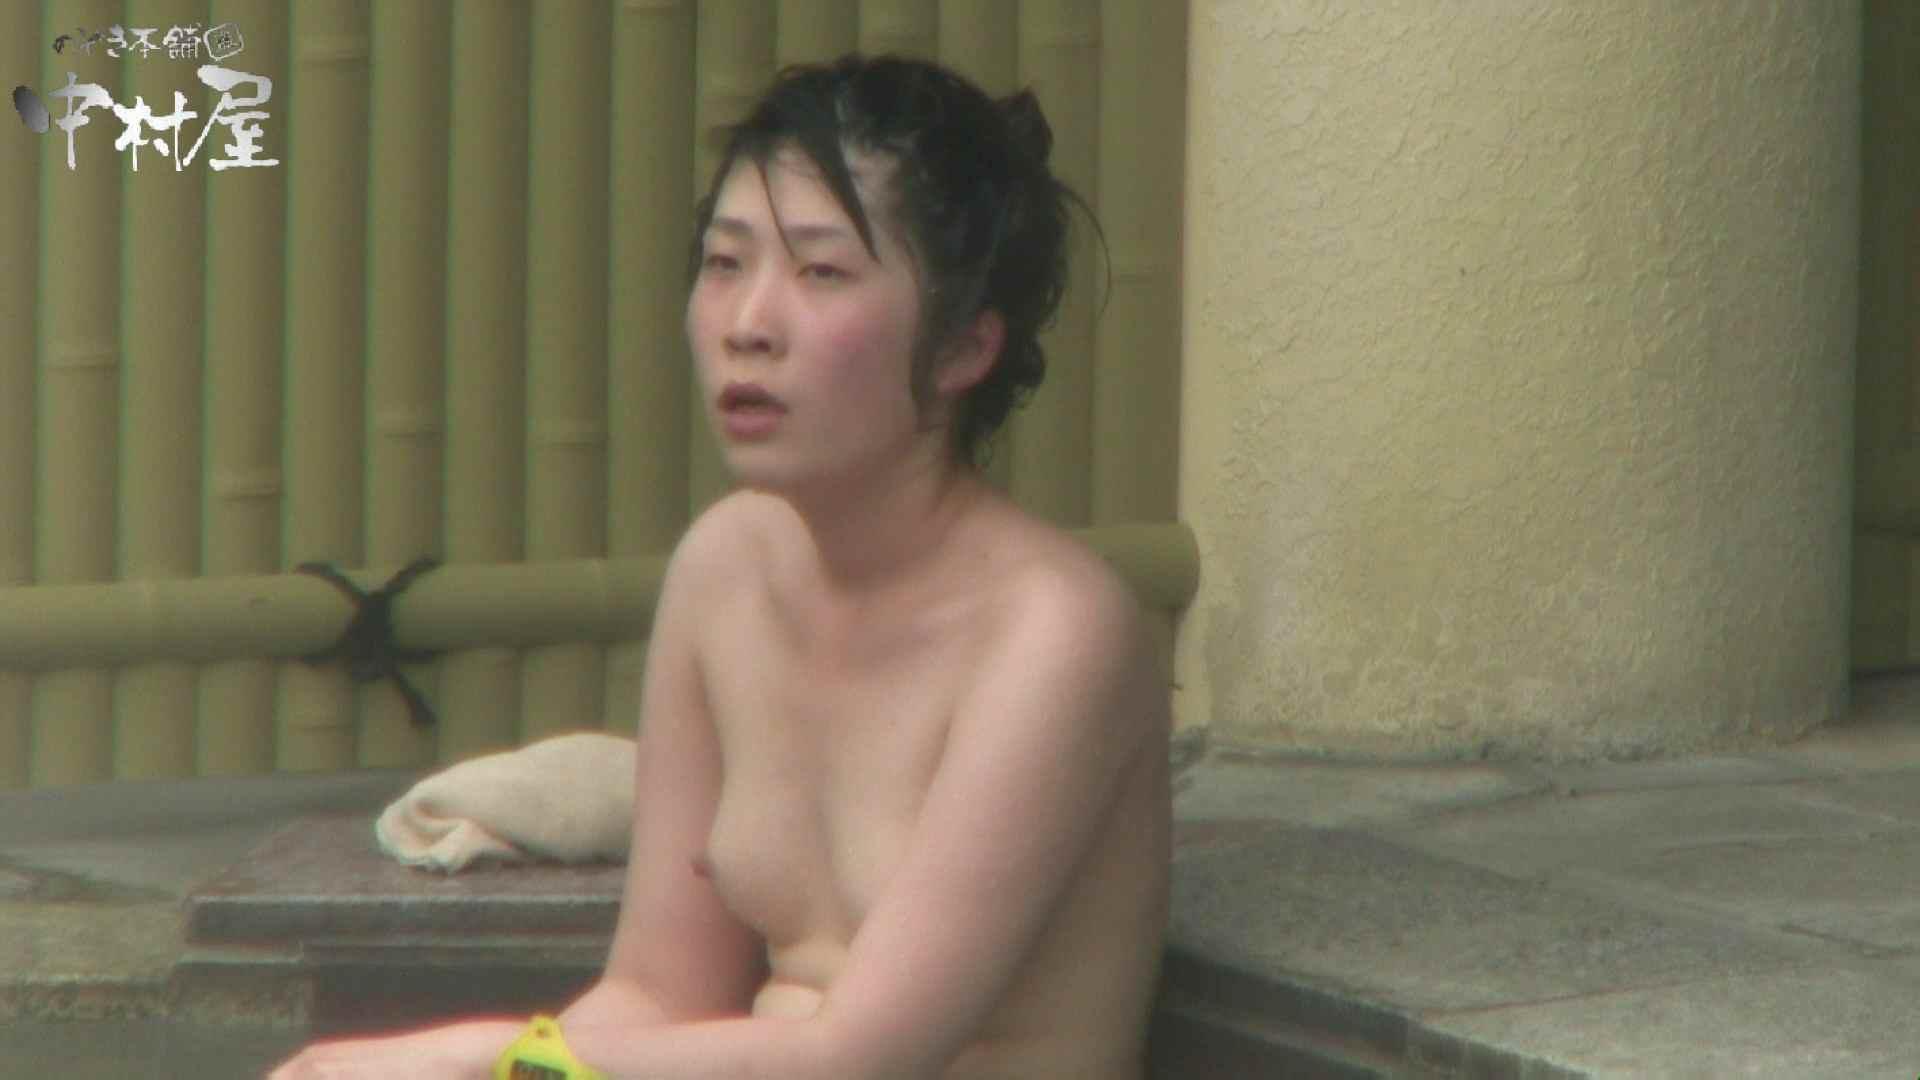 Aquaな露天風呂Vol.955 盗撮師作品  85pic 33